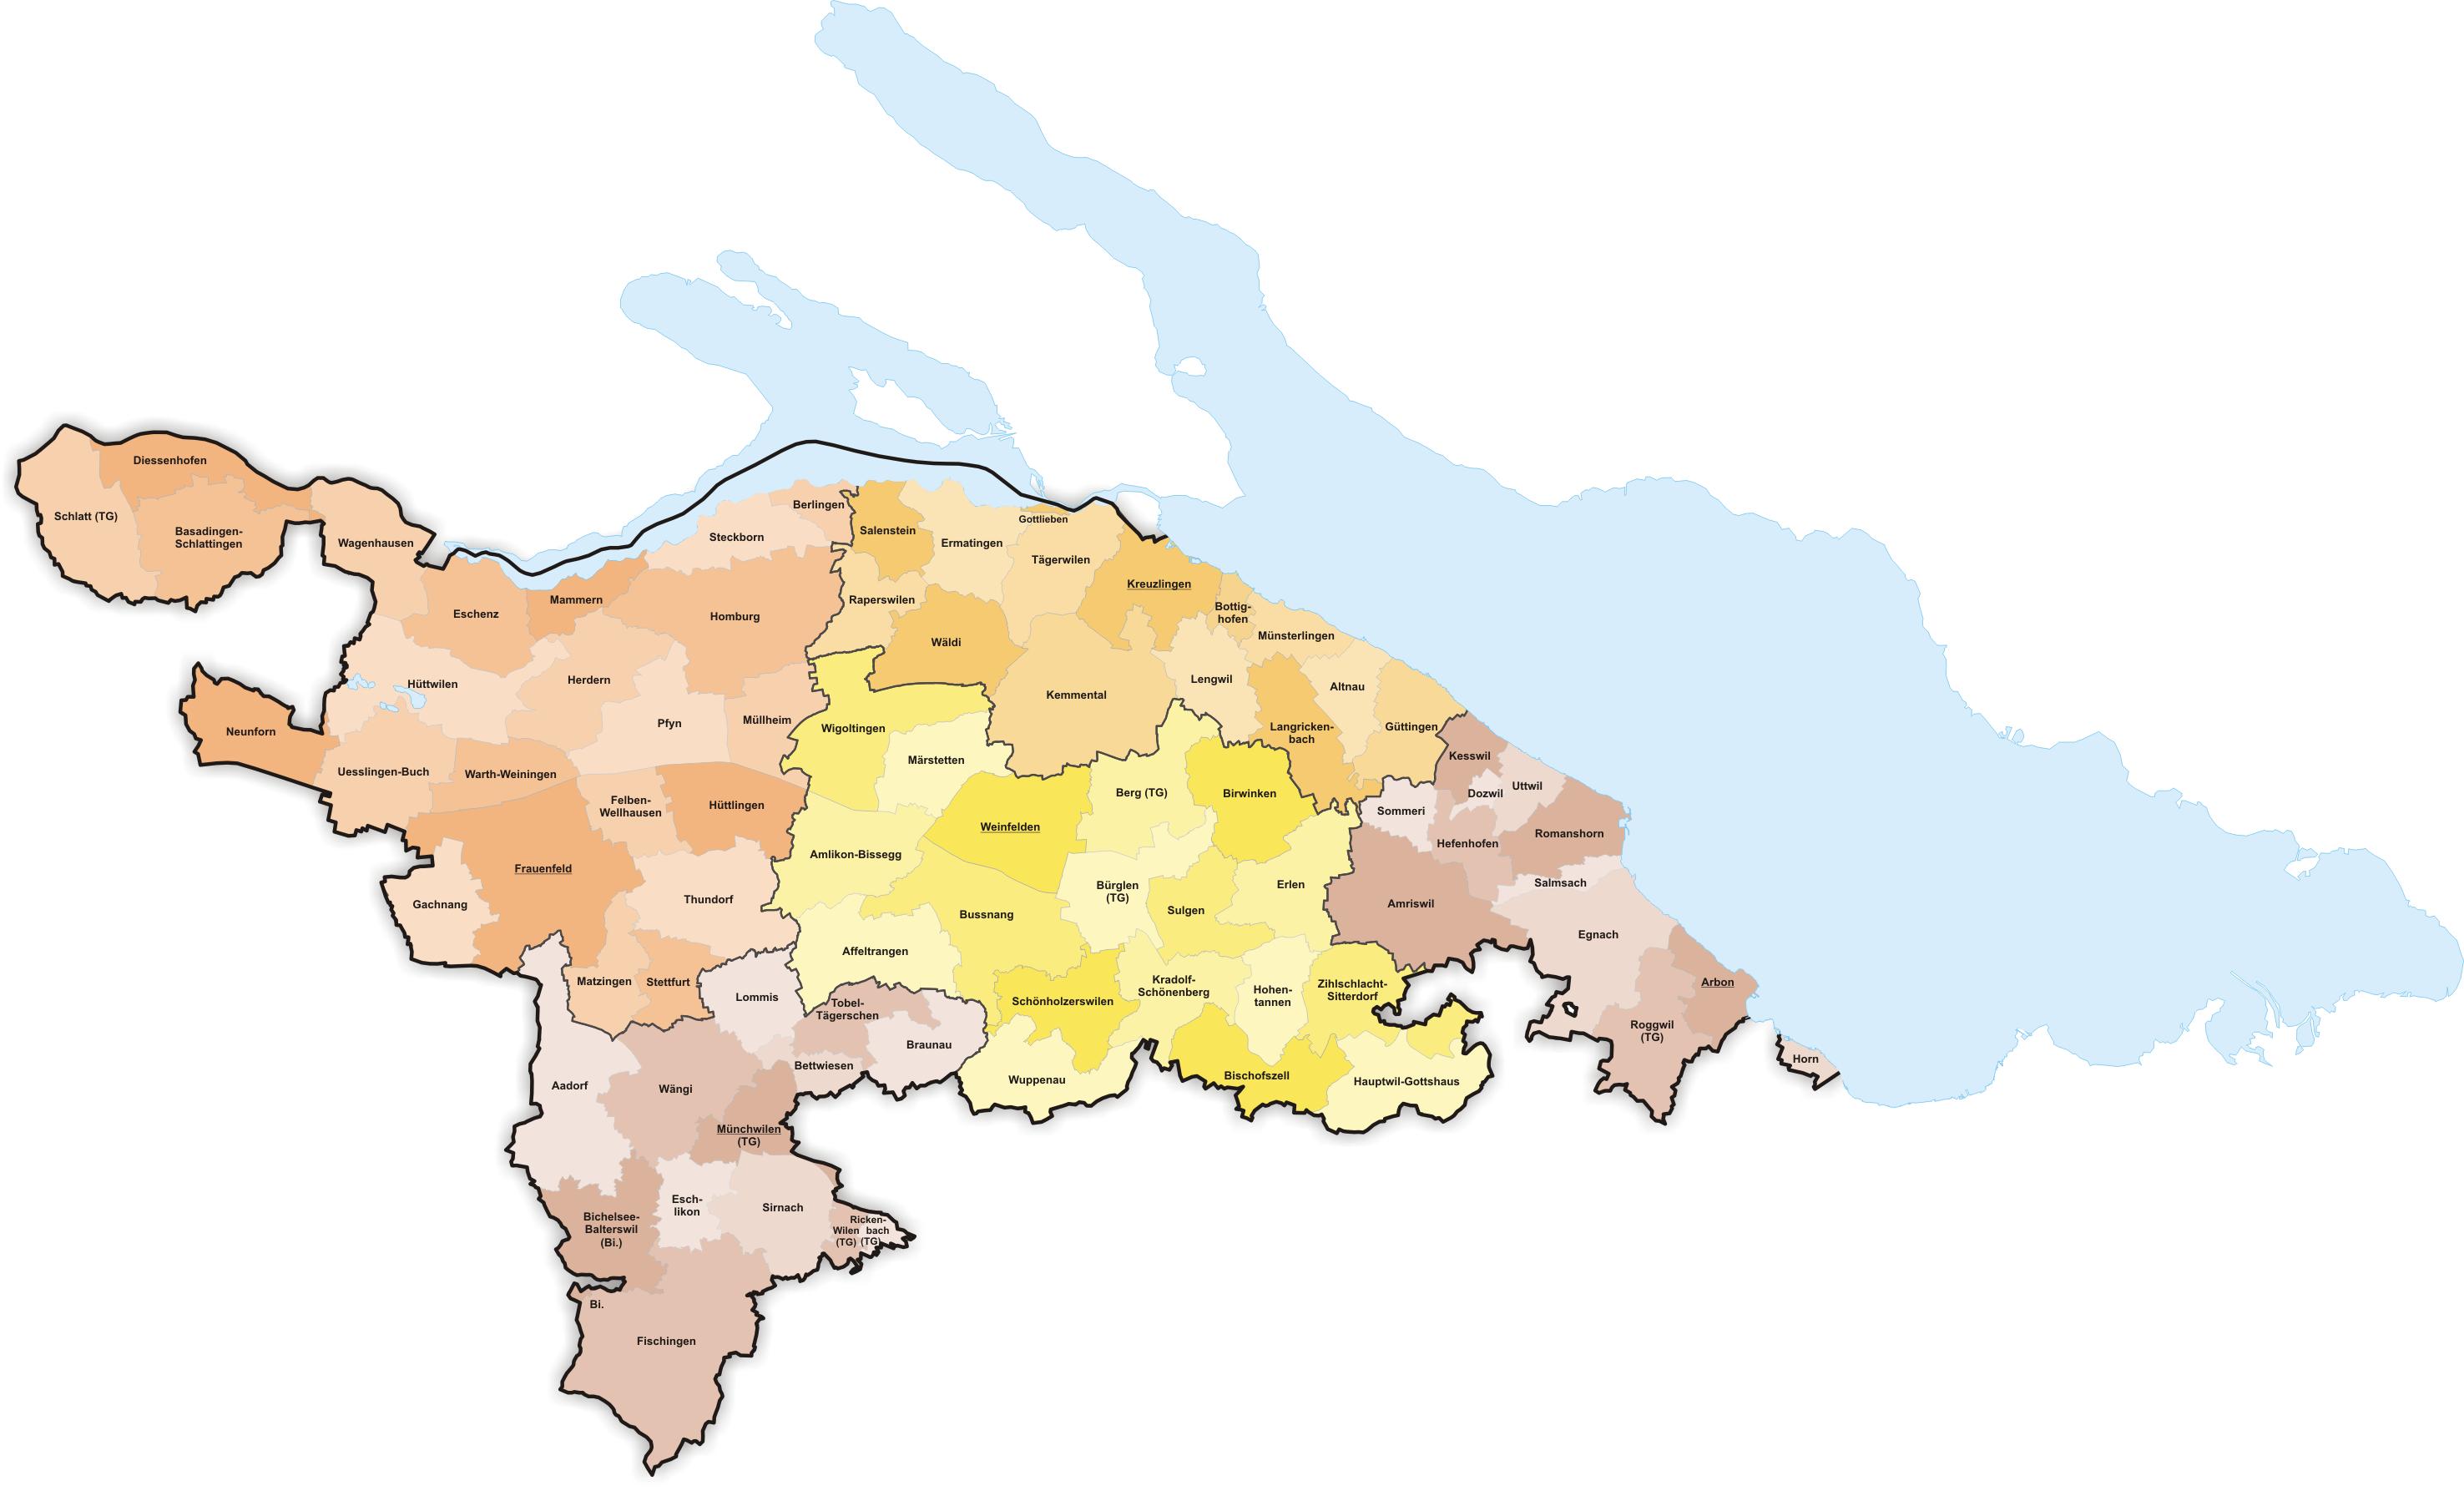 FileKarte Gemeinden des Kantons Thurgau farbig 2011png Wikimedia